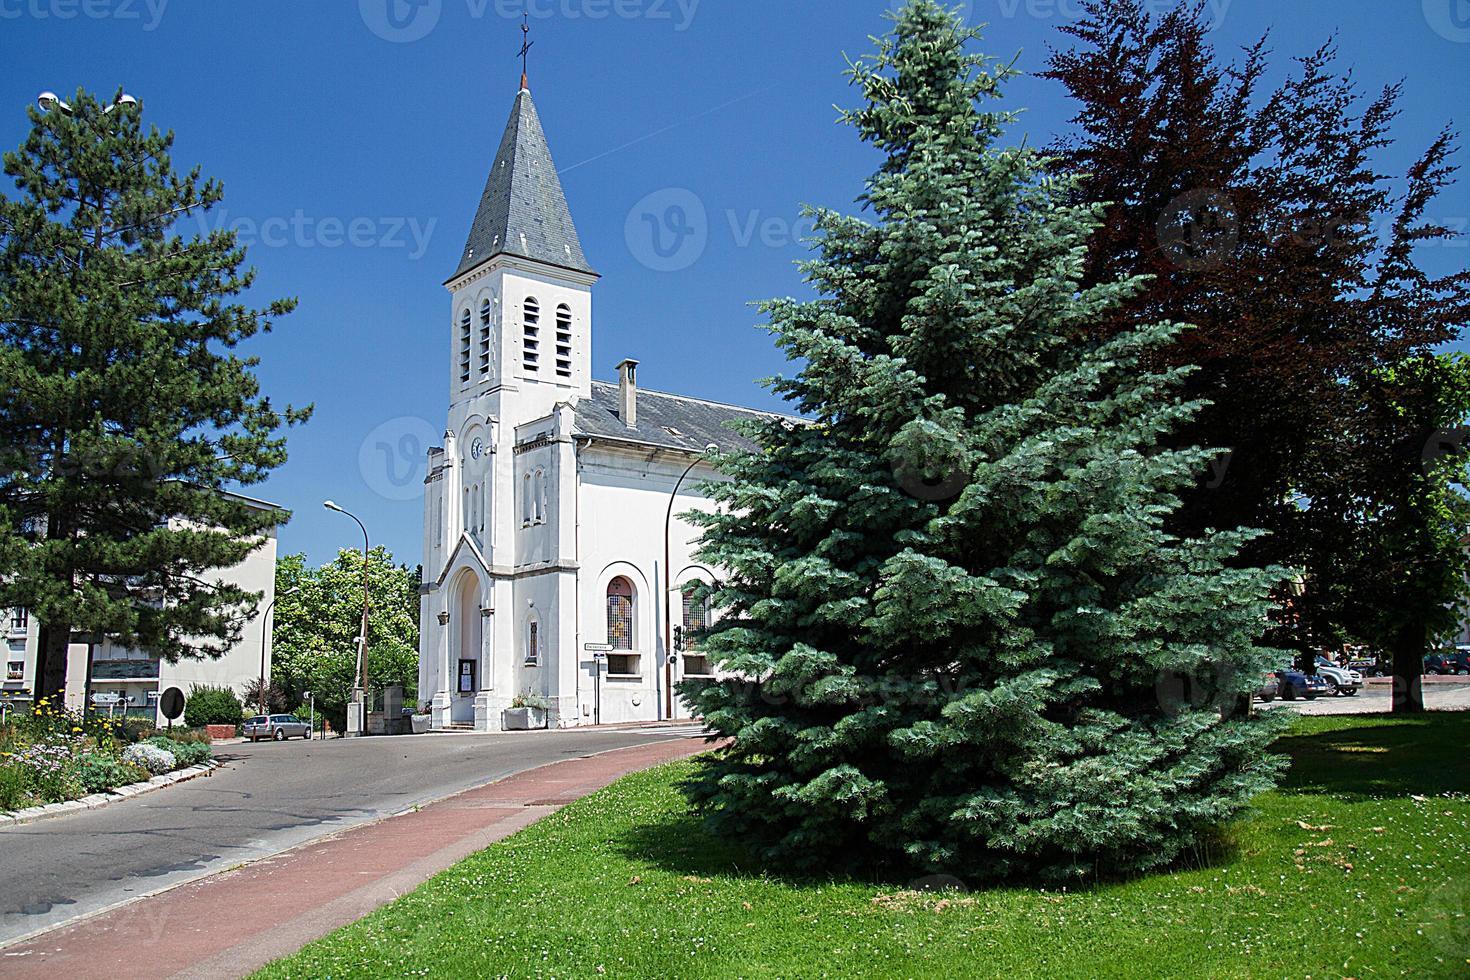 Church of village photo